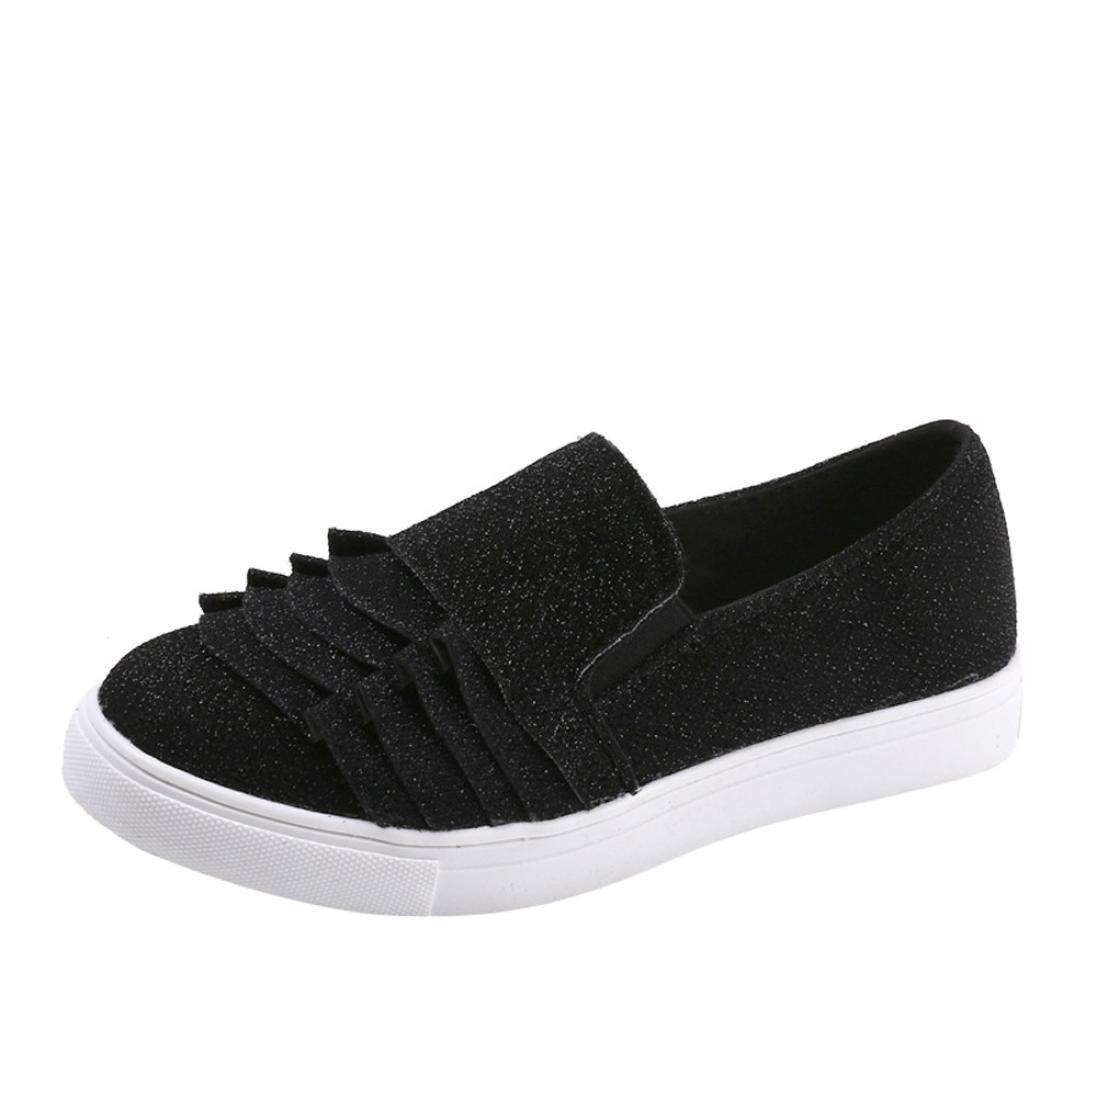 DENER Women Flat Shoes,Designer Lace Slip on Wide Width Comfortable Boat Casual Walking Shoes Loafers Espadrilles (Black, 42)